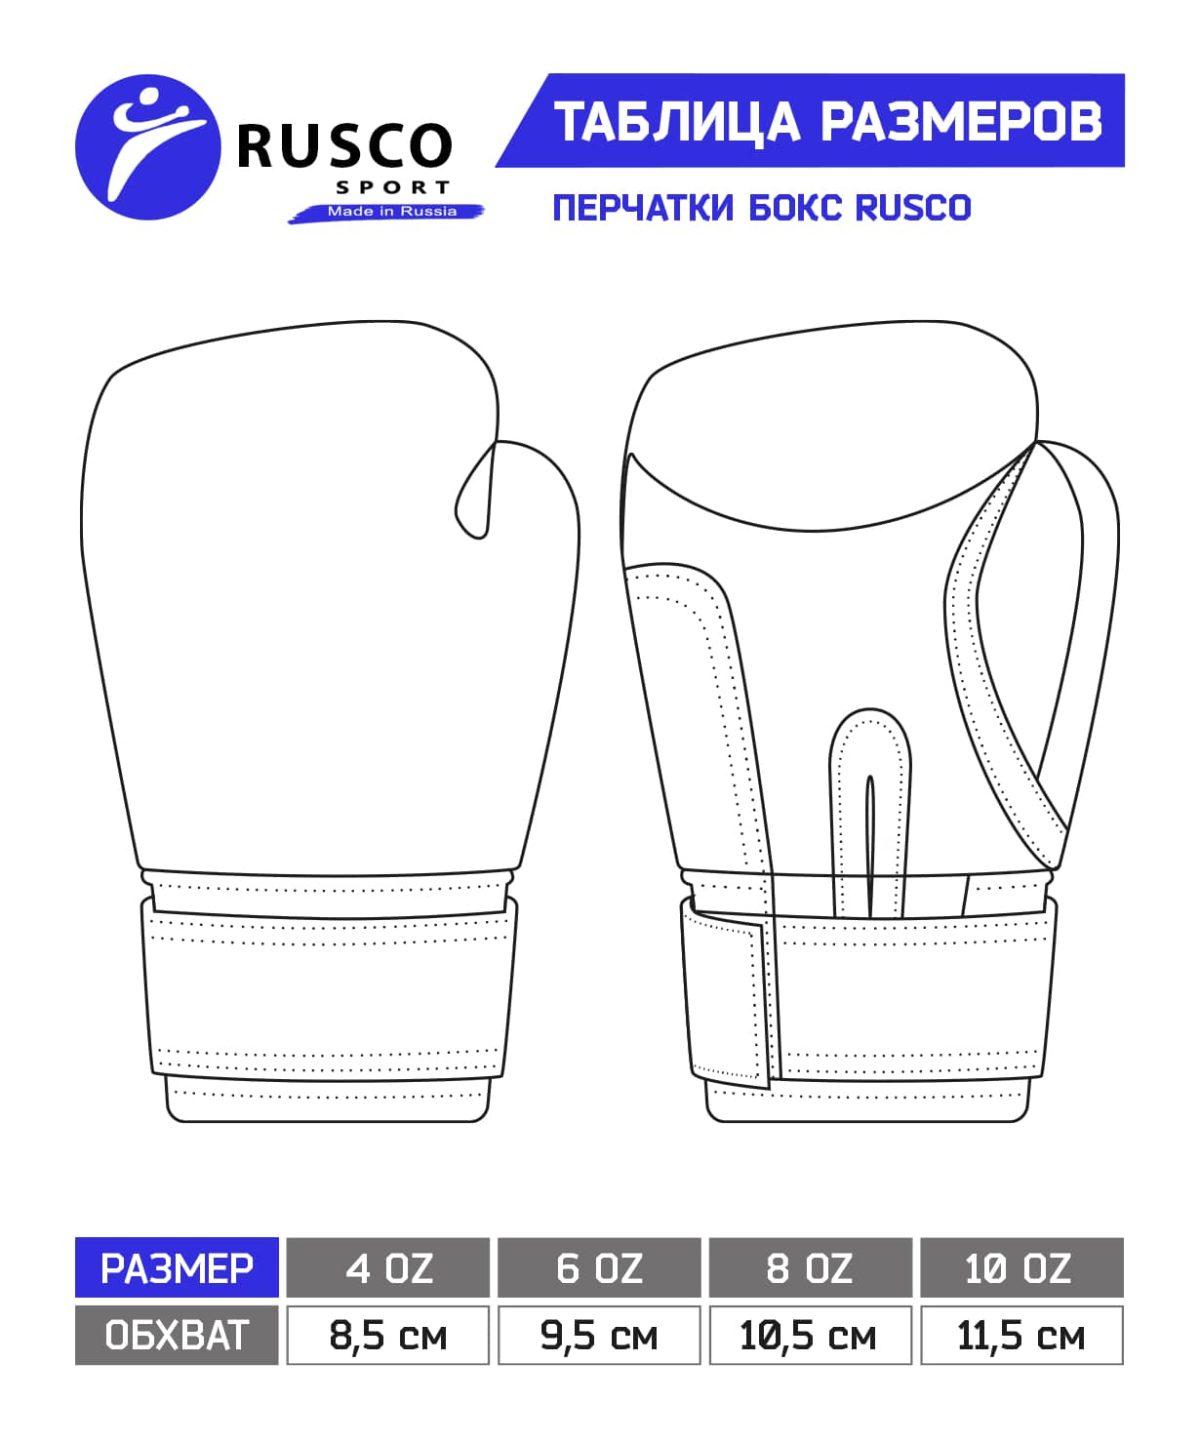 RUSCO Перчатки бокс. 8oz, к/з  18529 - 2